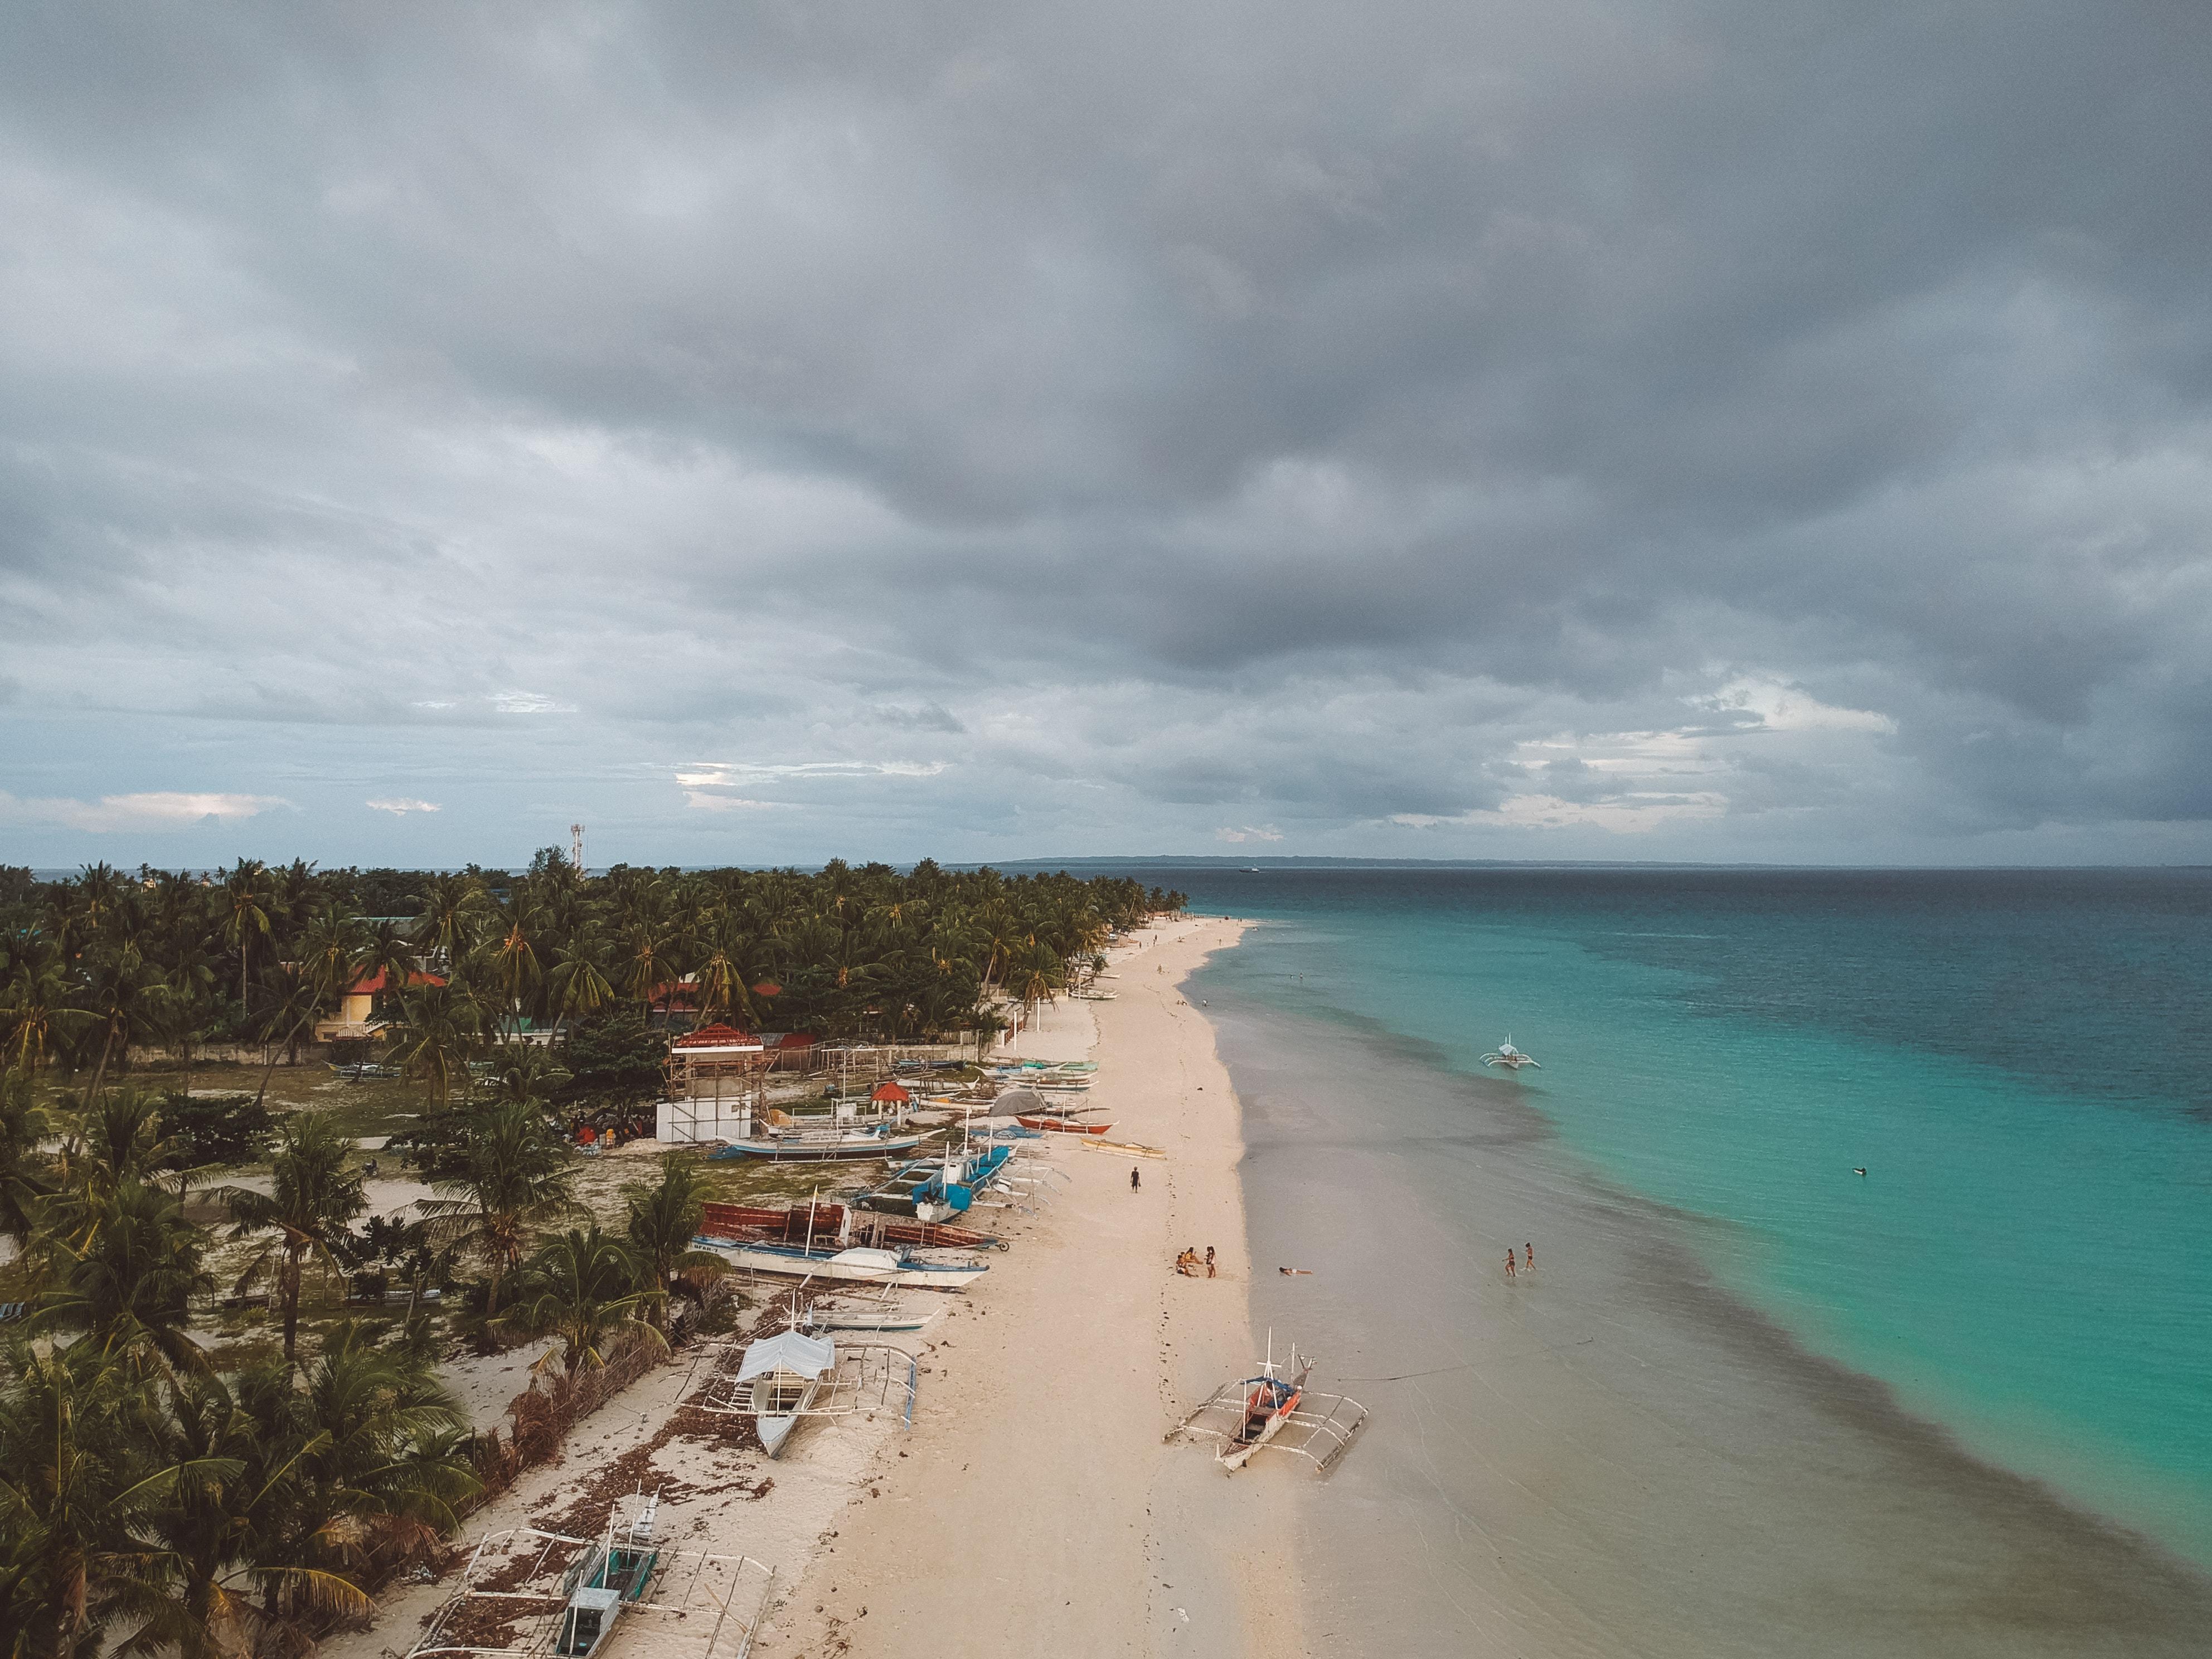 bantayan island beaches, Beaches in Bantayan, Kota Beach